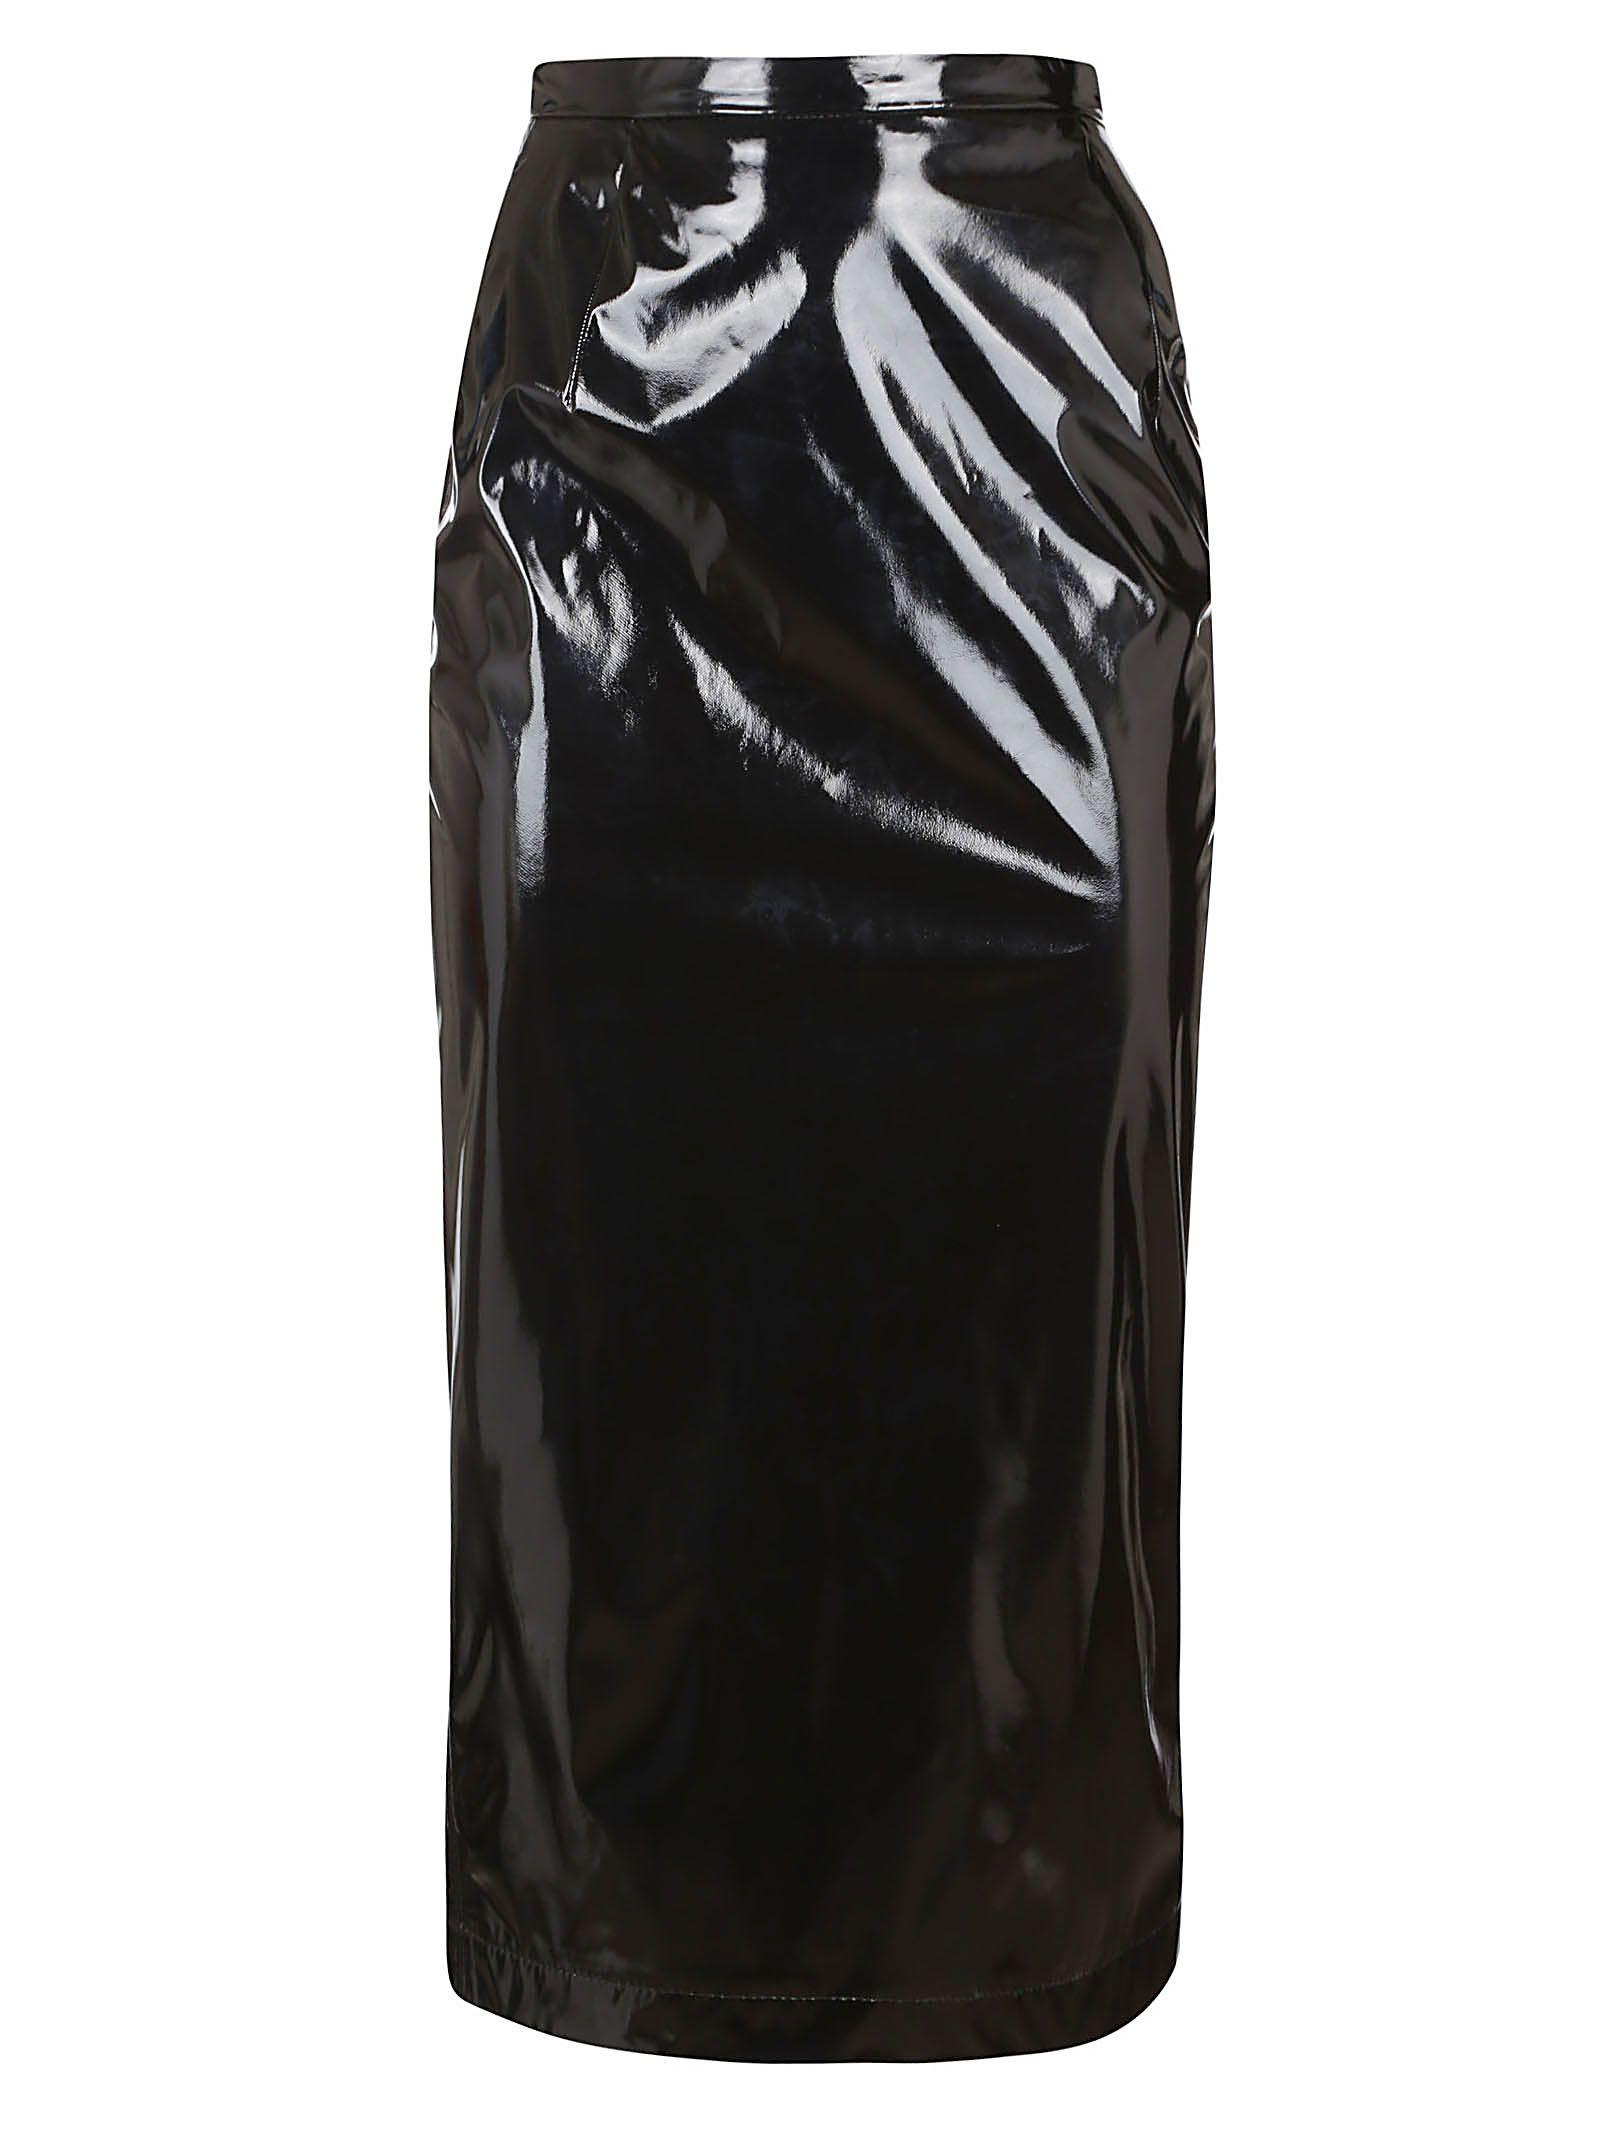 n.21 -  Grazia Skirt